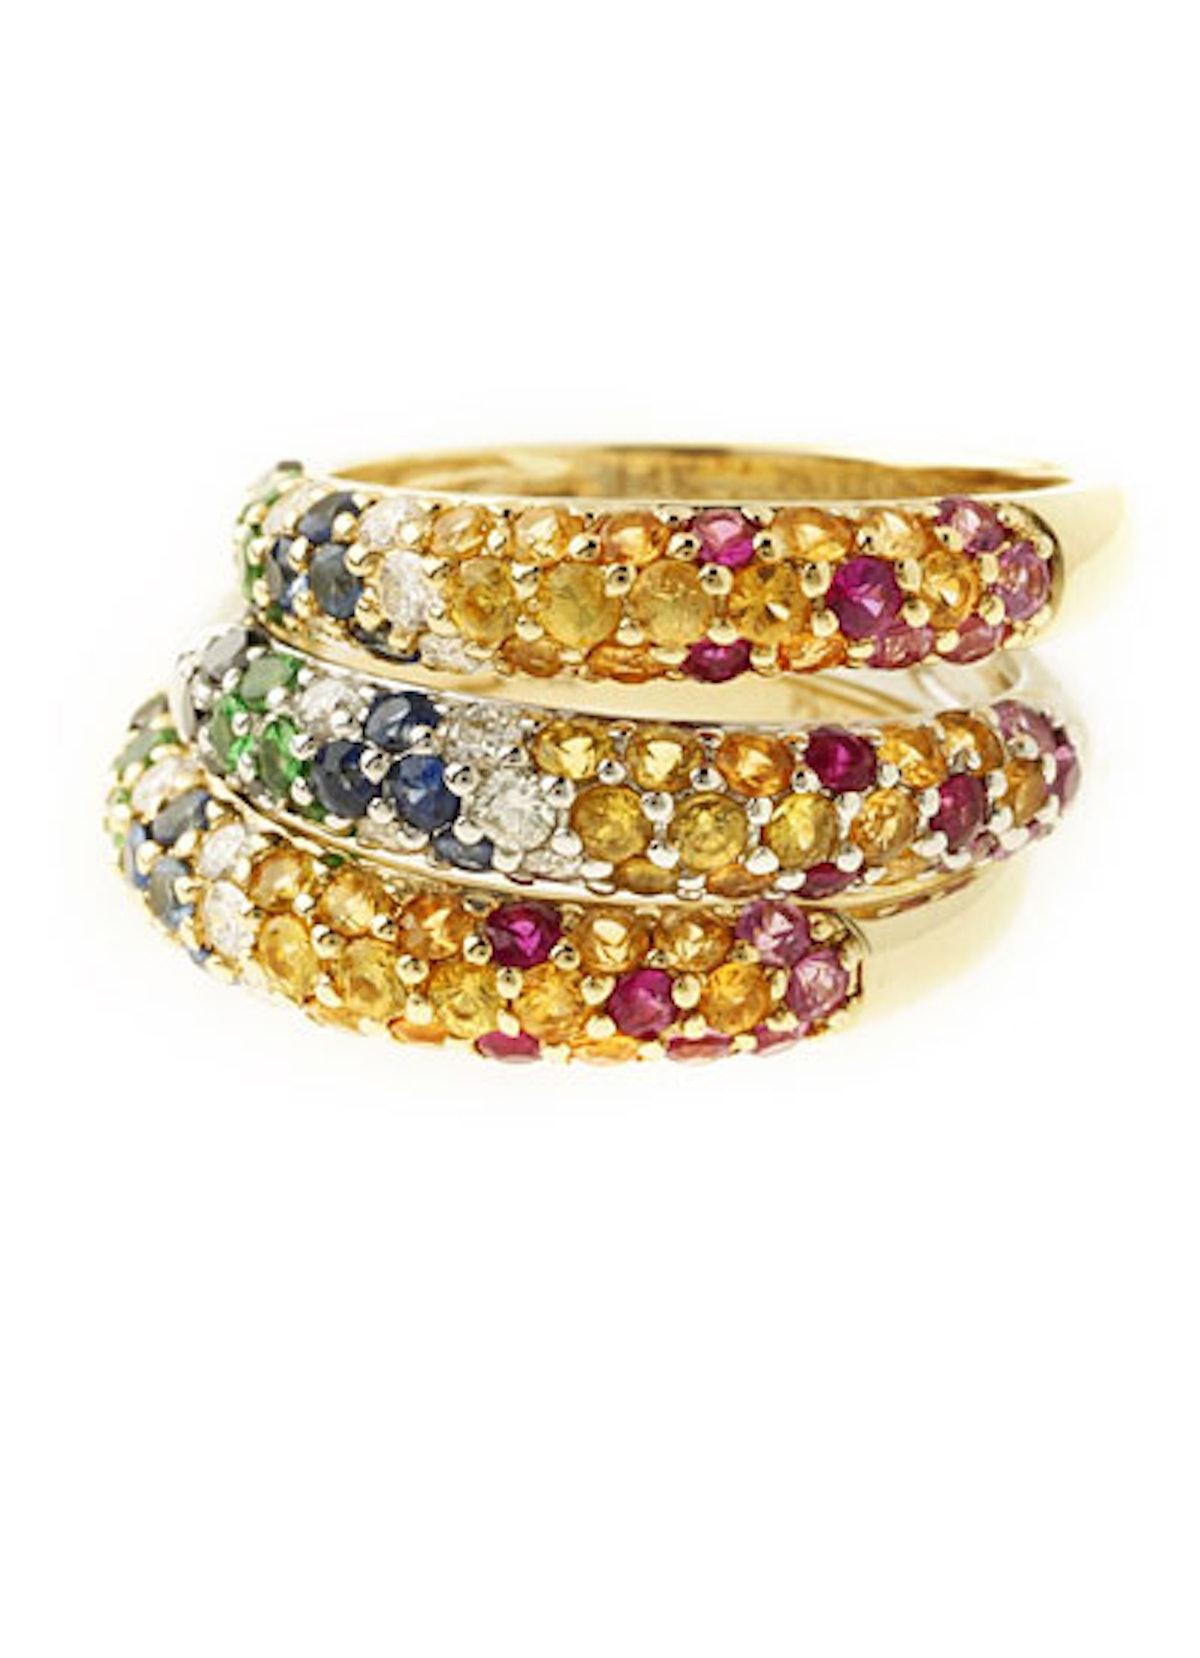 acss-colorful-gems-04-v.jpg